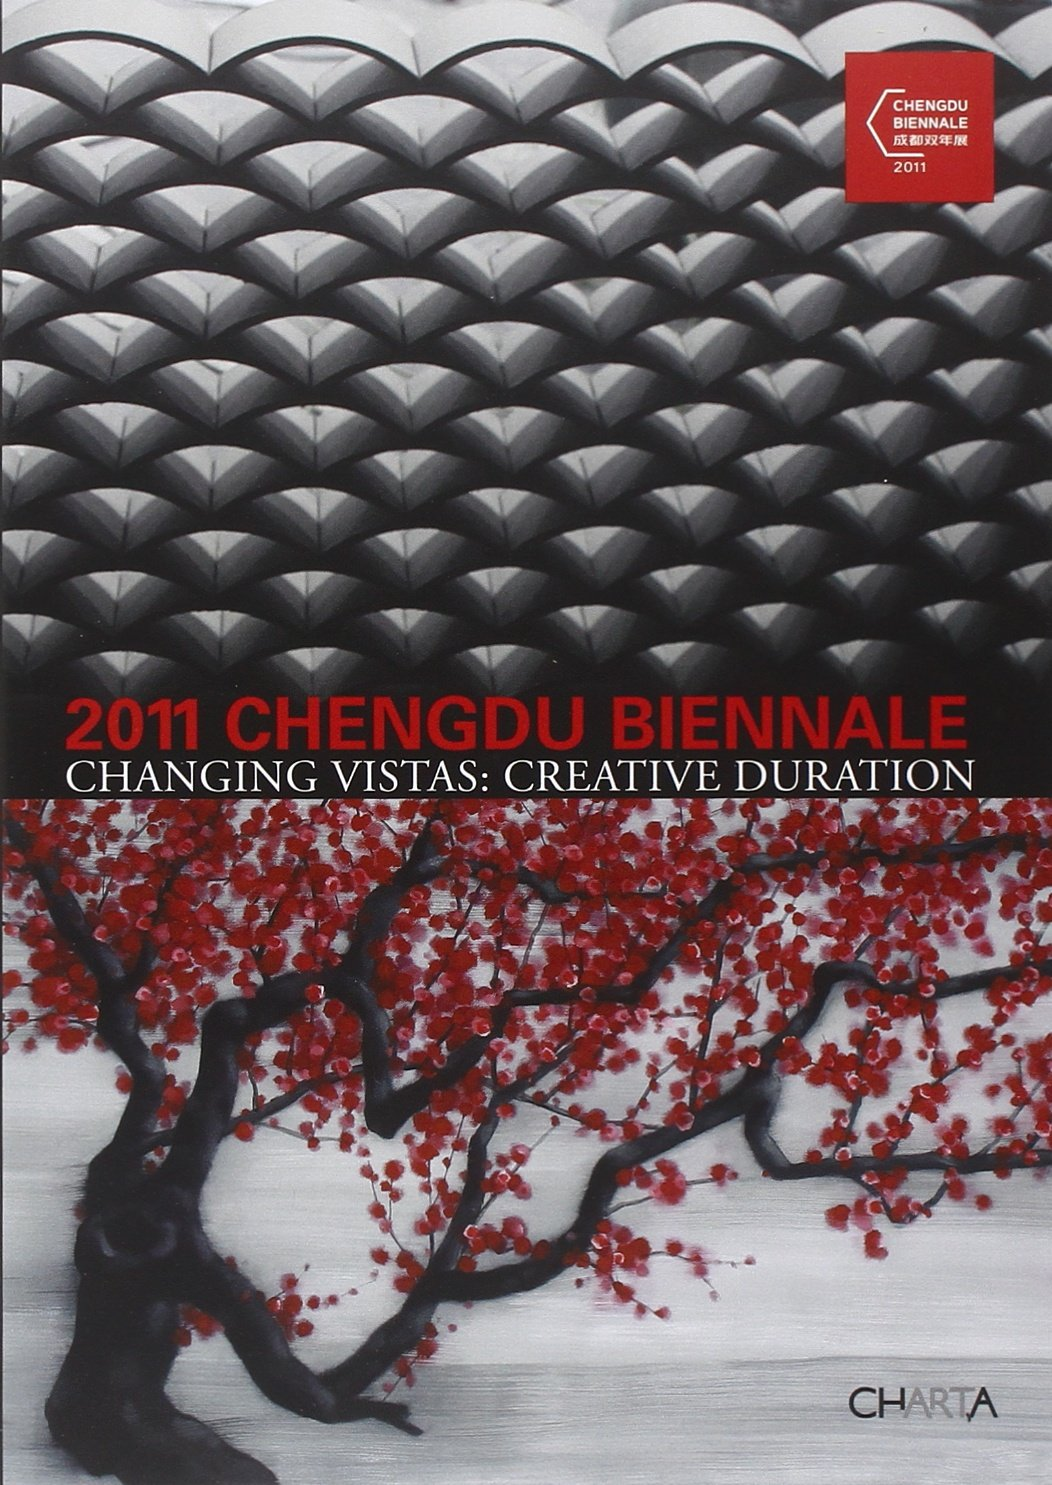 The Chengdu Biennale pdf